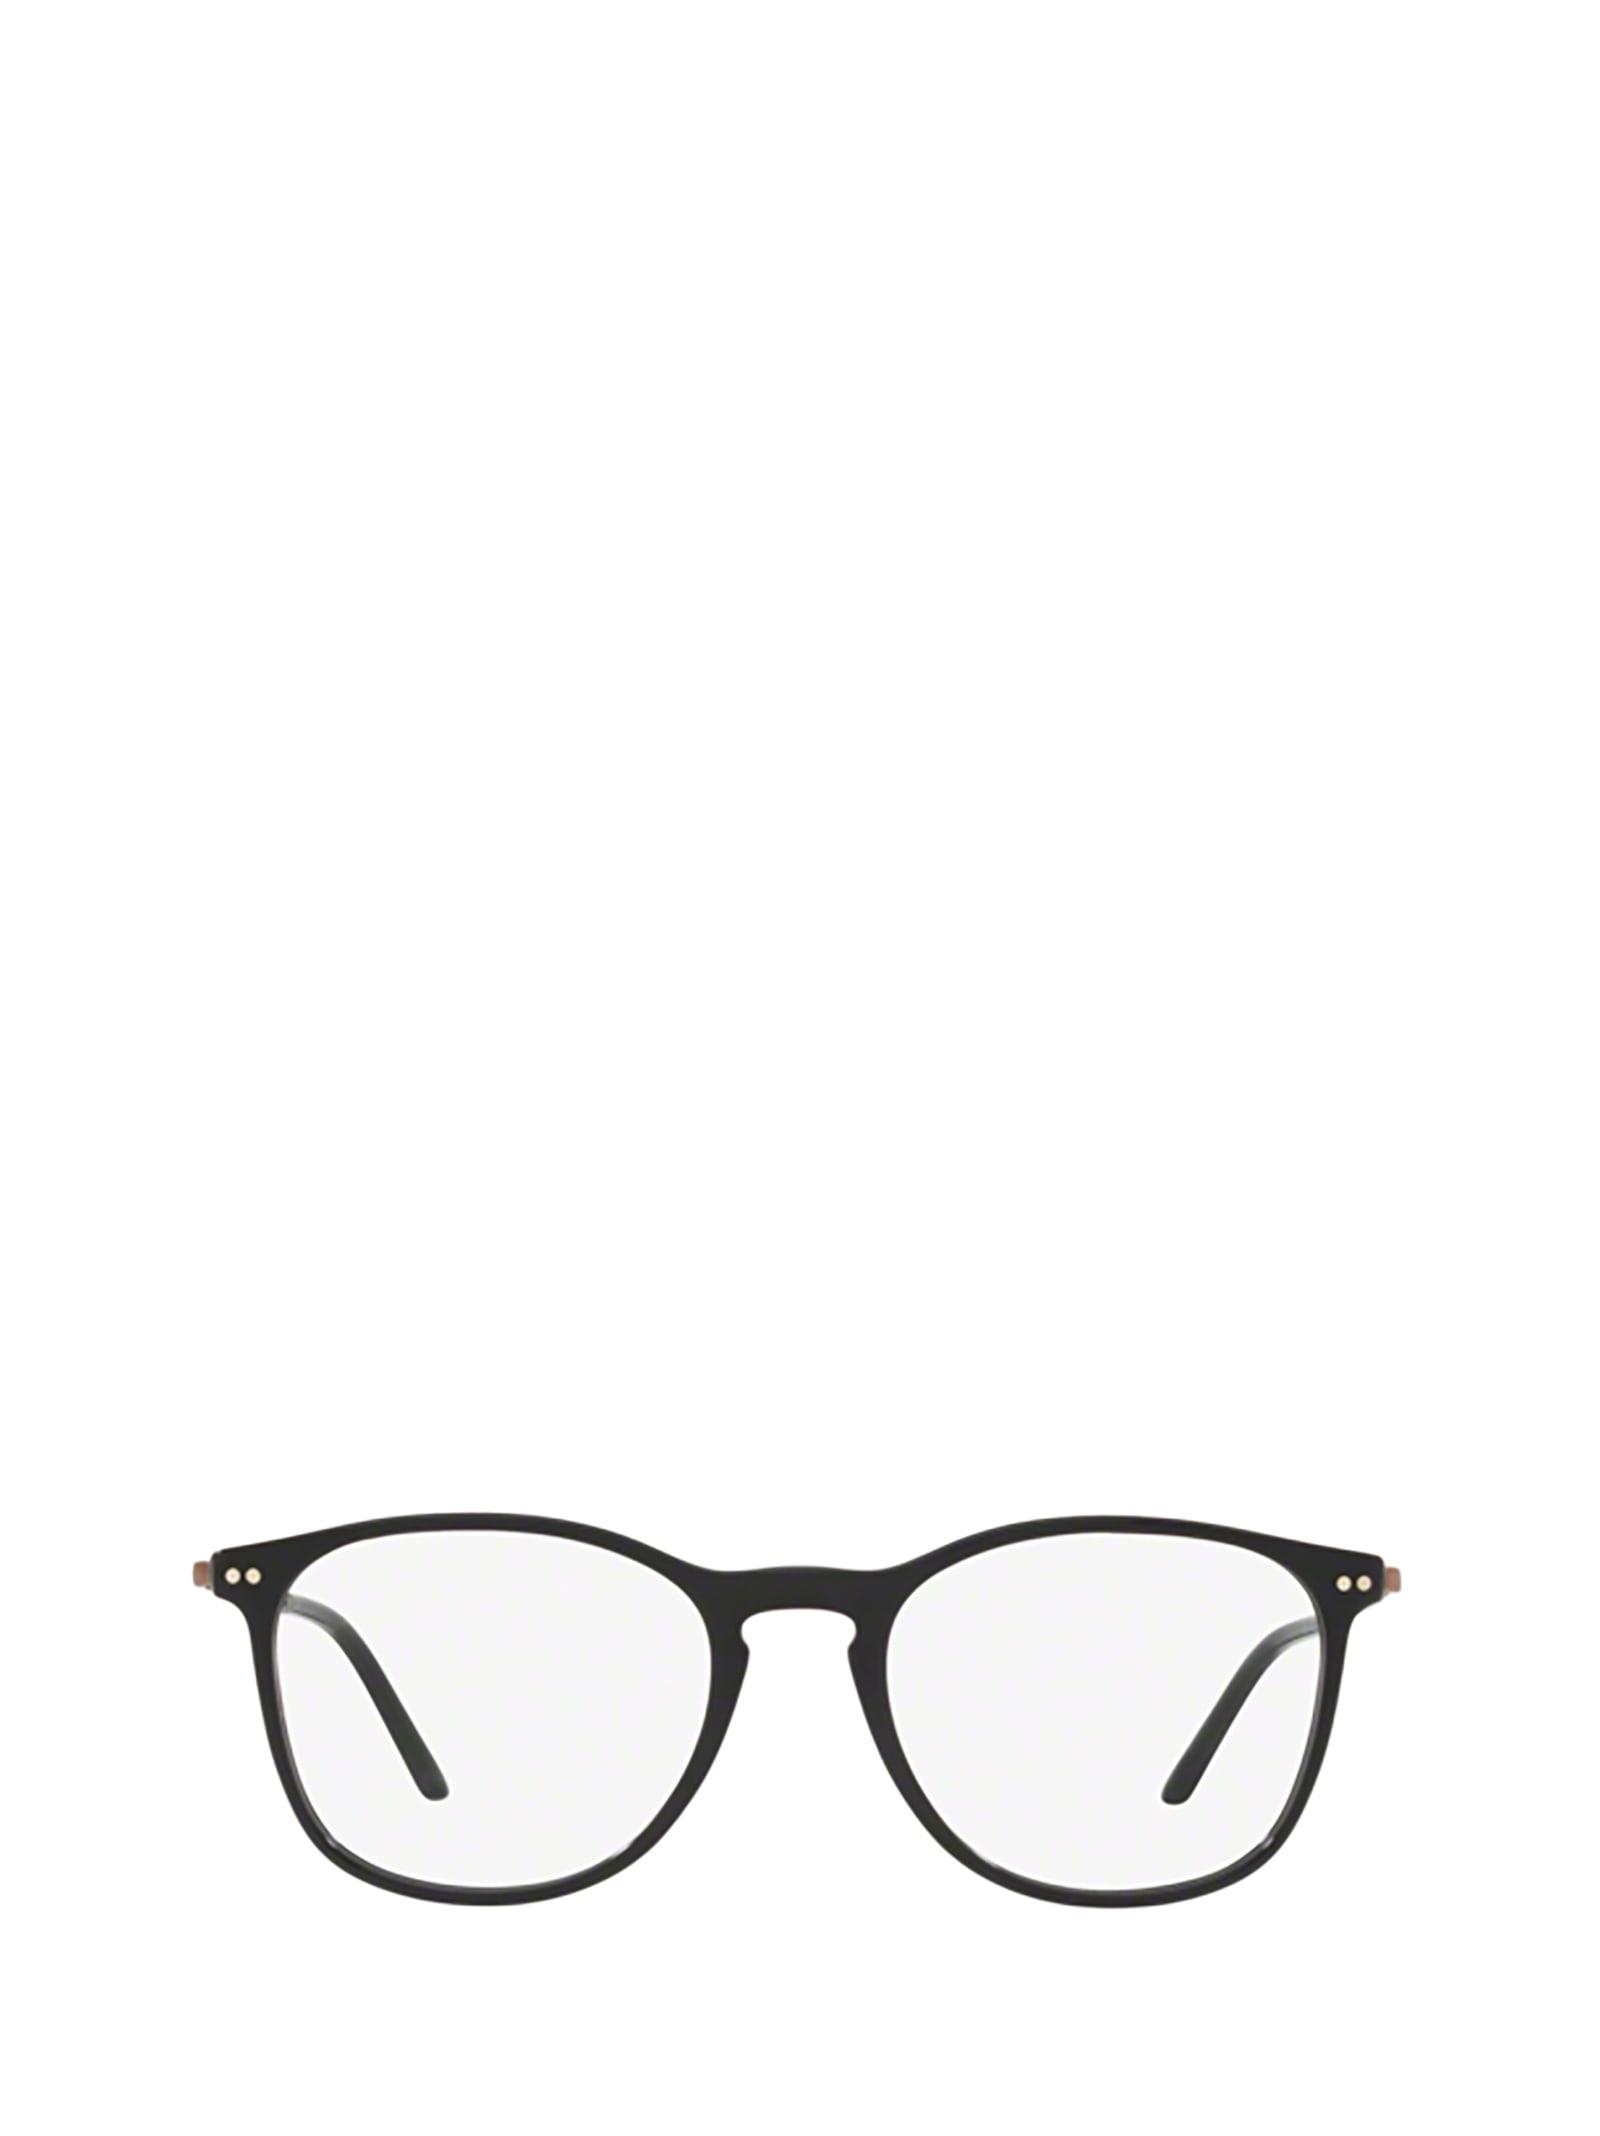 Giorgio Armani Giorgio Armani Ar7160 Black Glasses